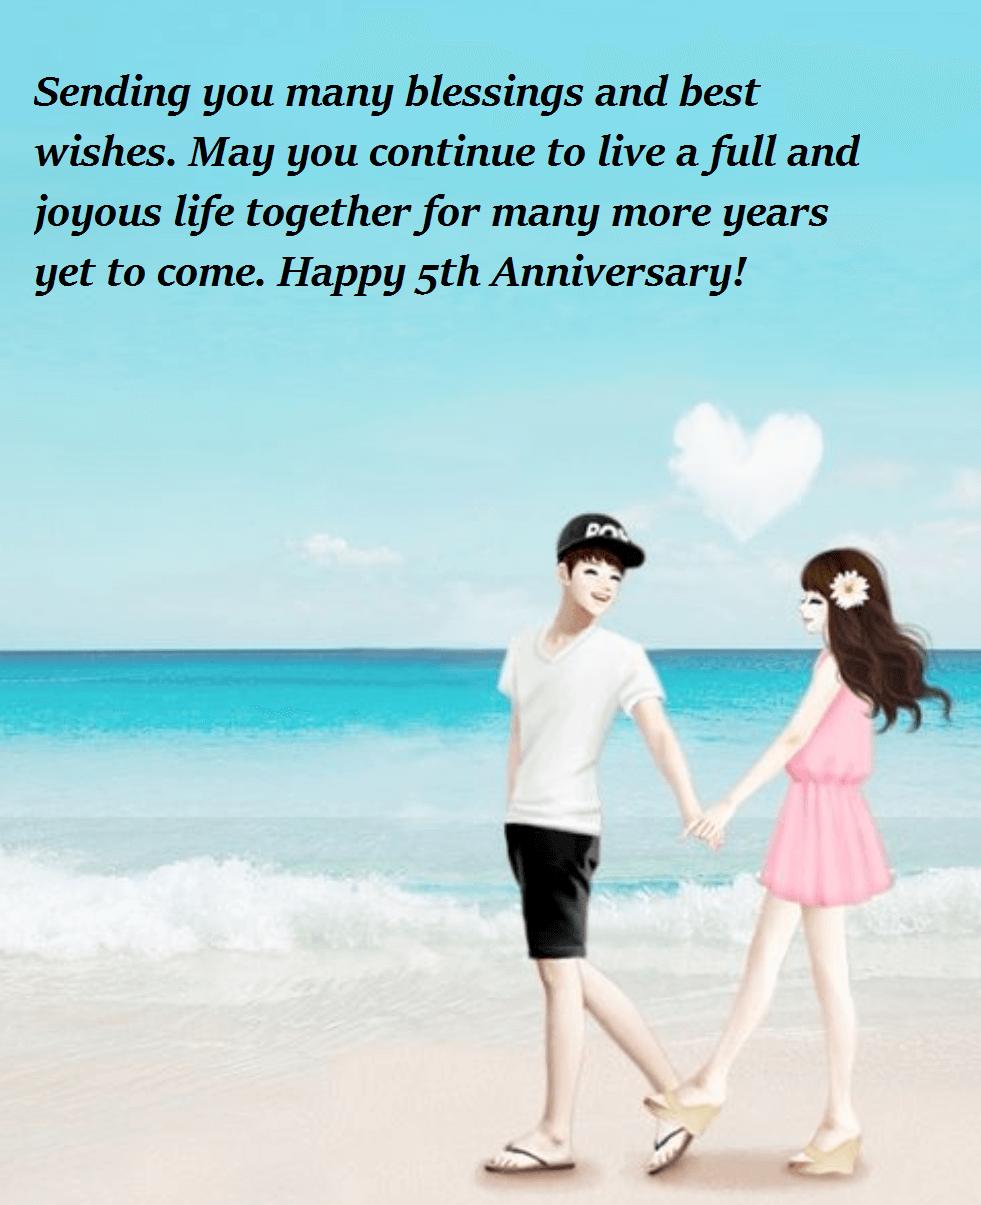 Happy 5th Wedding Anniversary Wishes to Sister | Wedding Anniversary ...